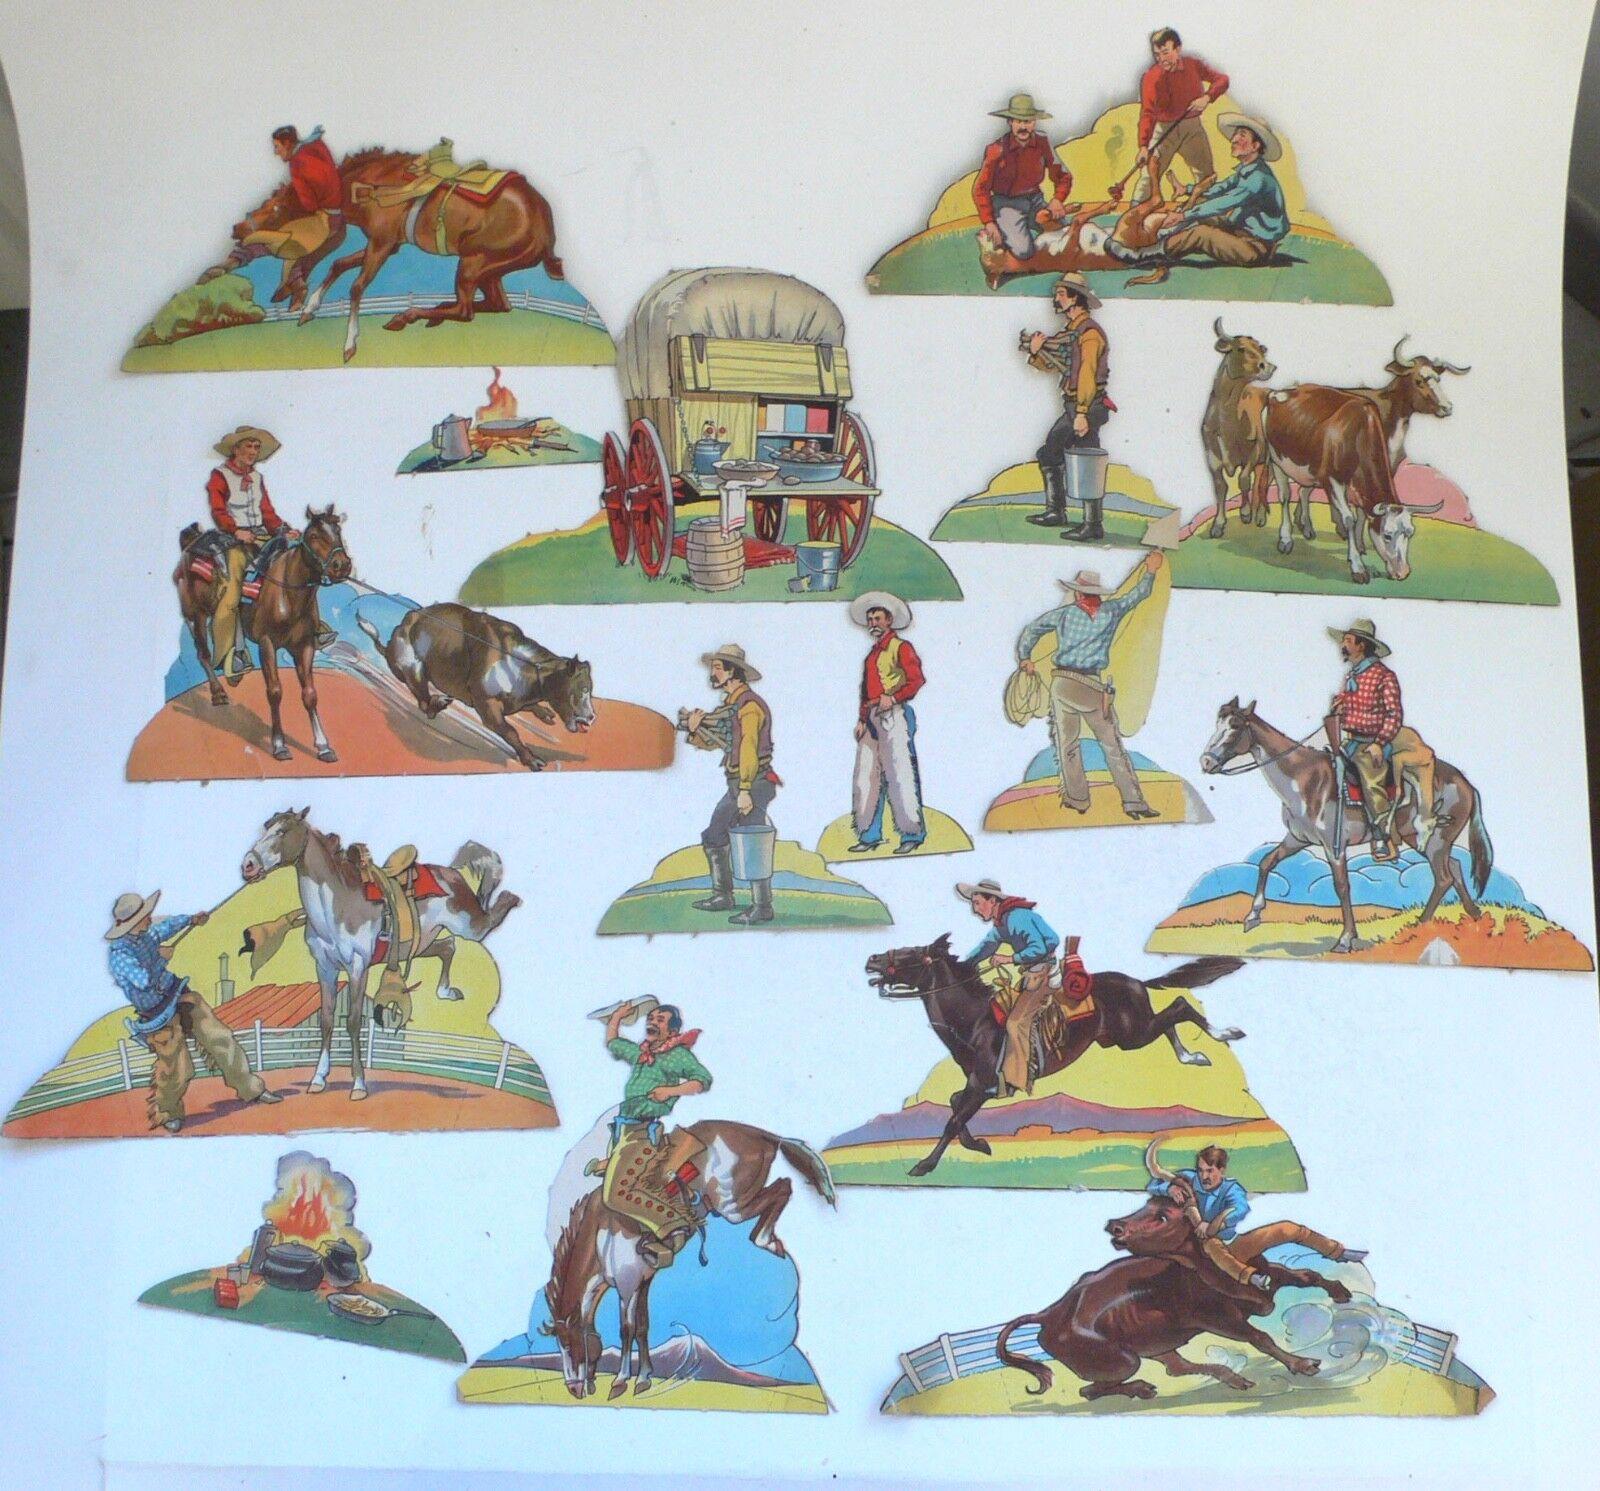 Vintage Paper Toys Toy set of Figures Wild West Western Cowboy Cowboys 1950's